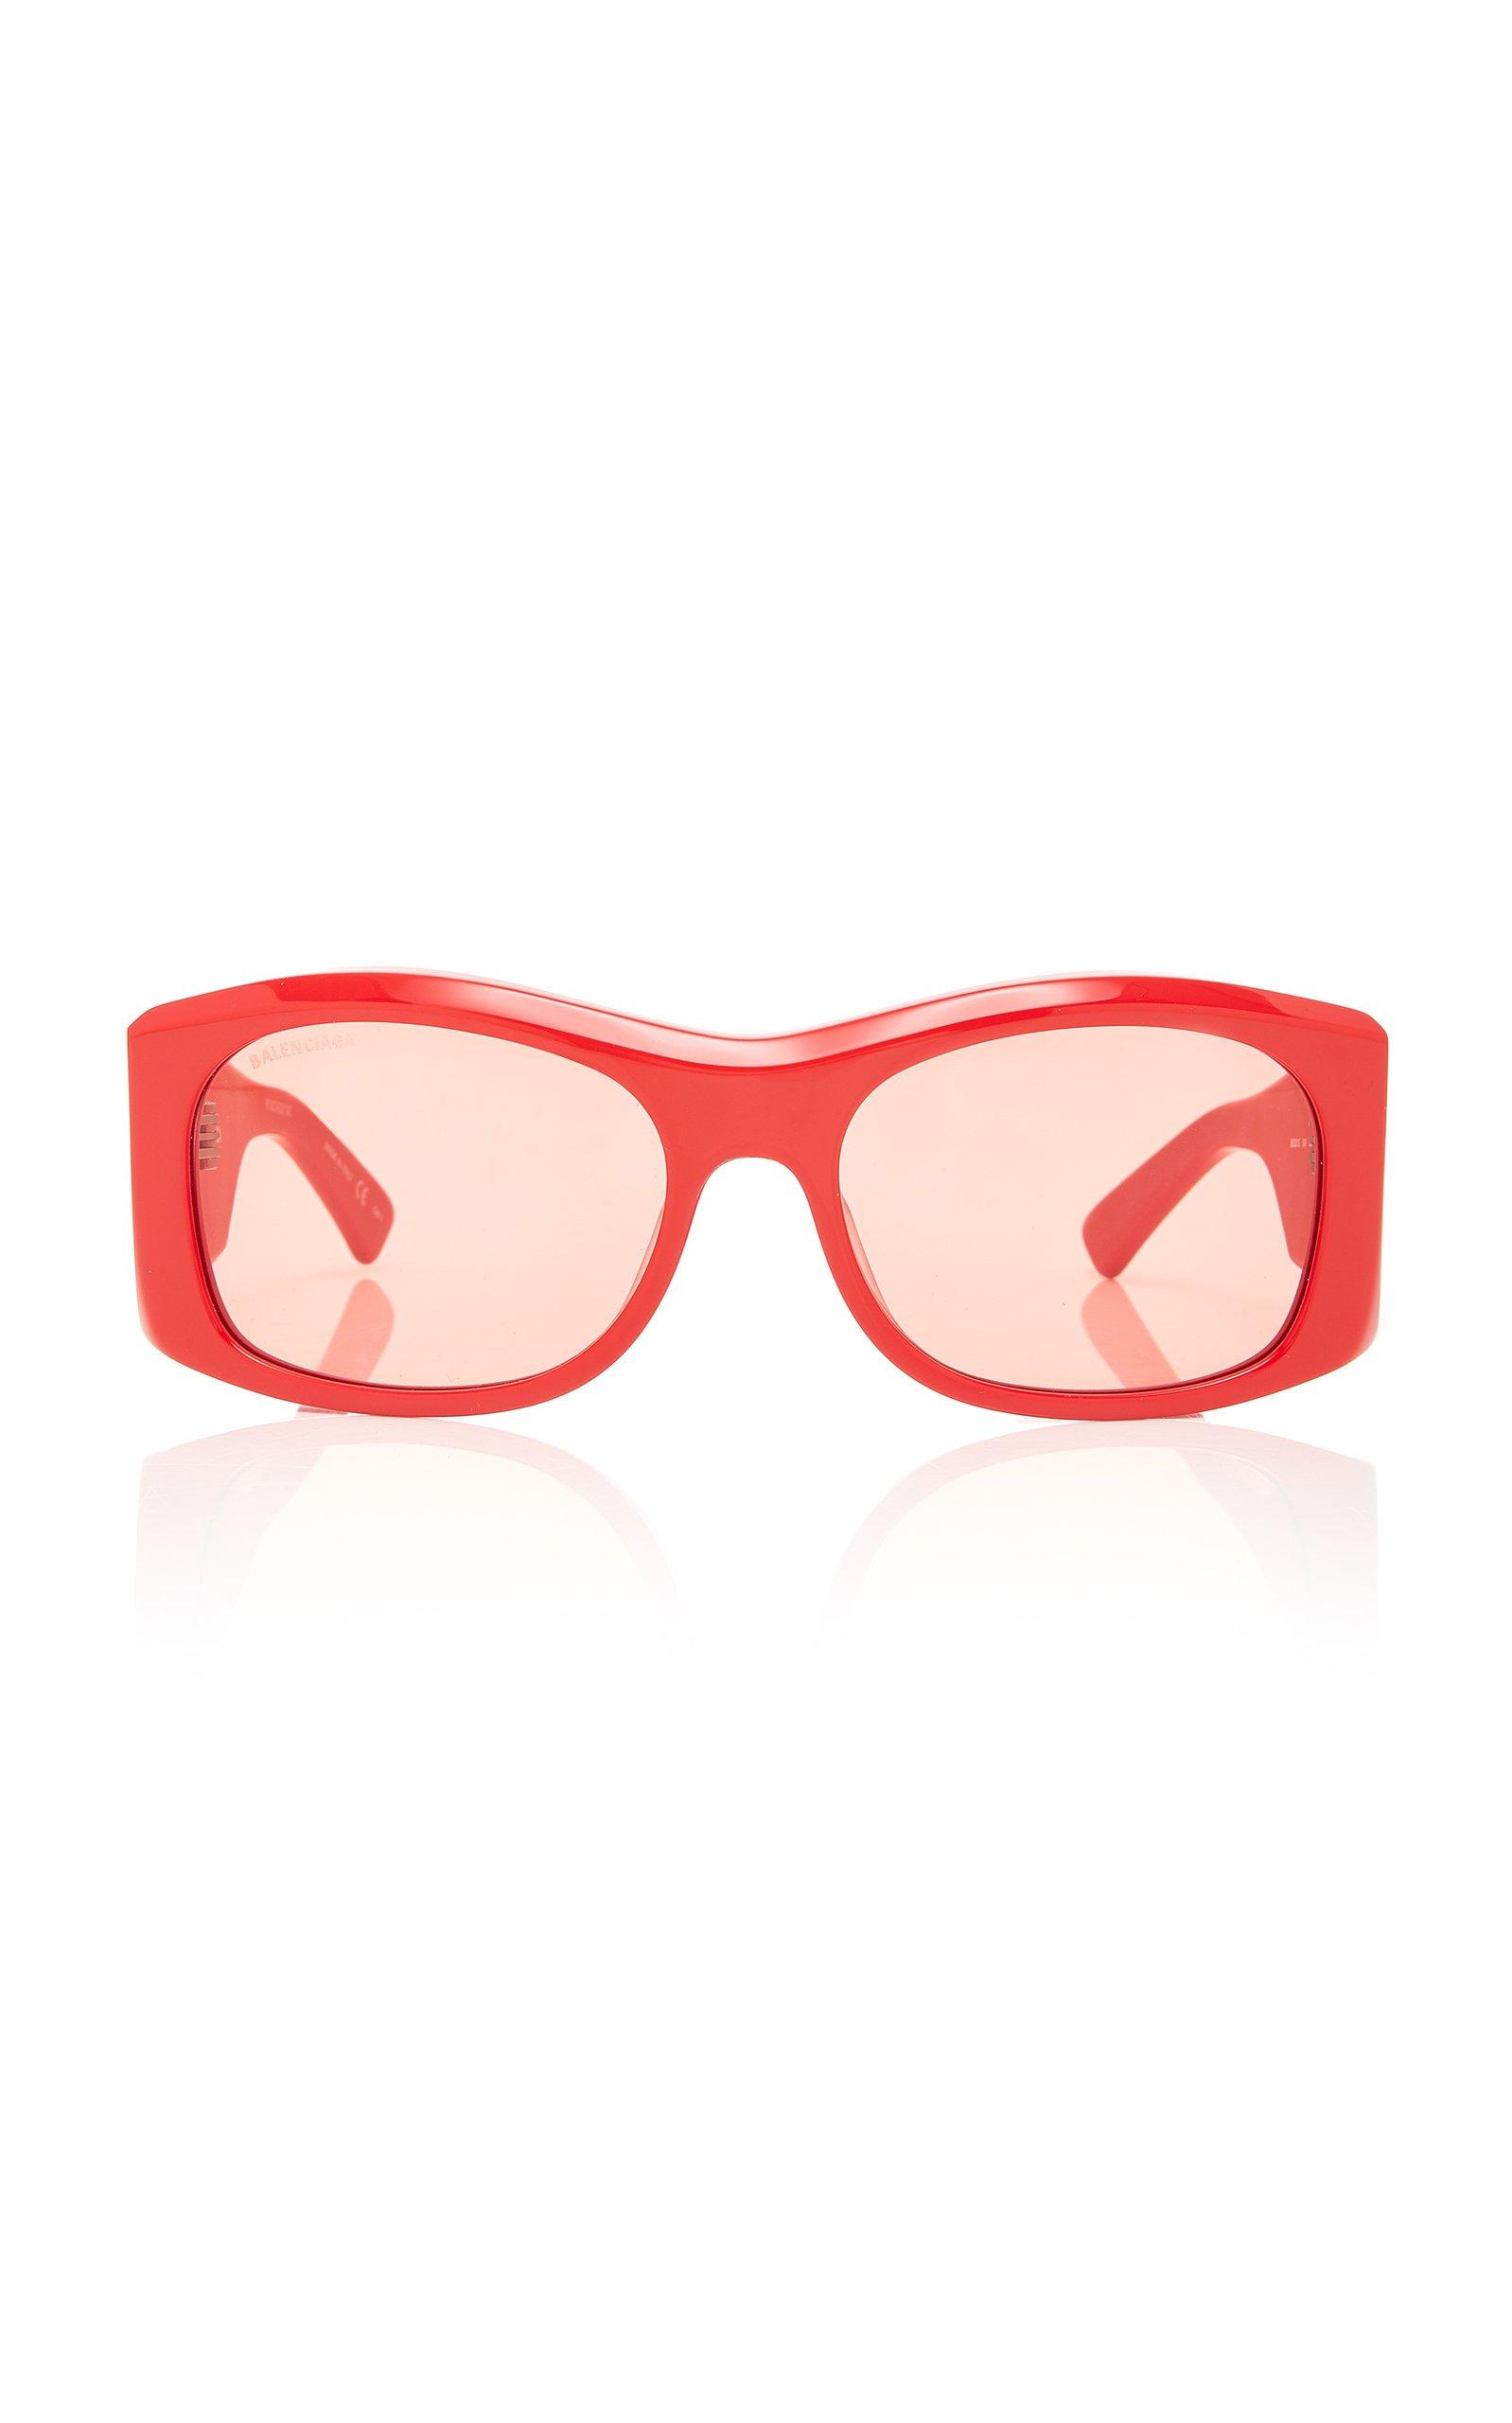 Balenciaga Sunglasses Square-Frame Acetate Sunglasses